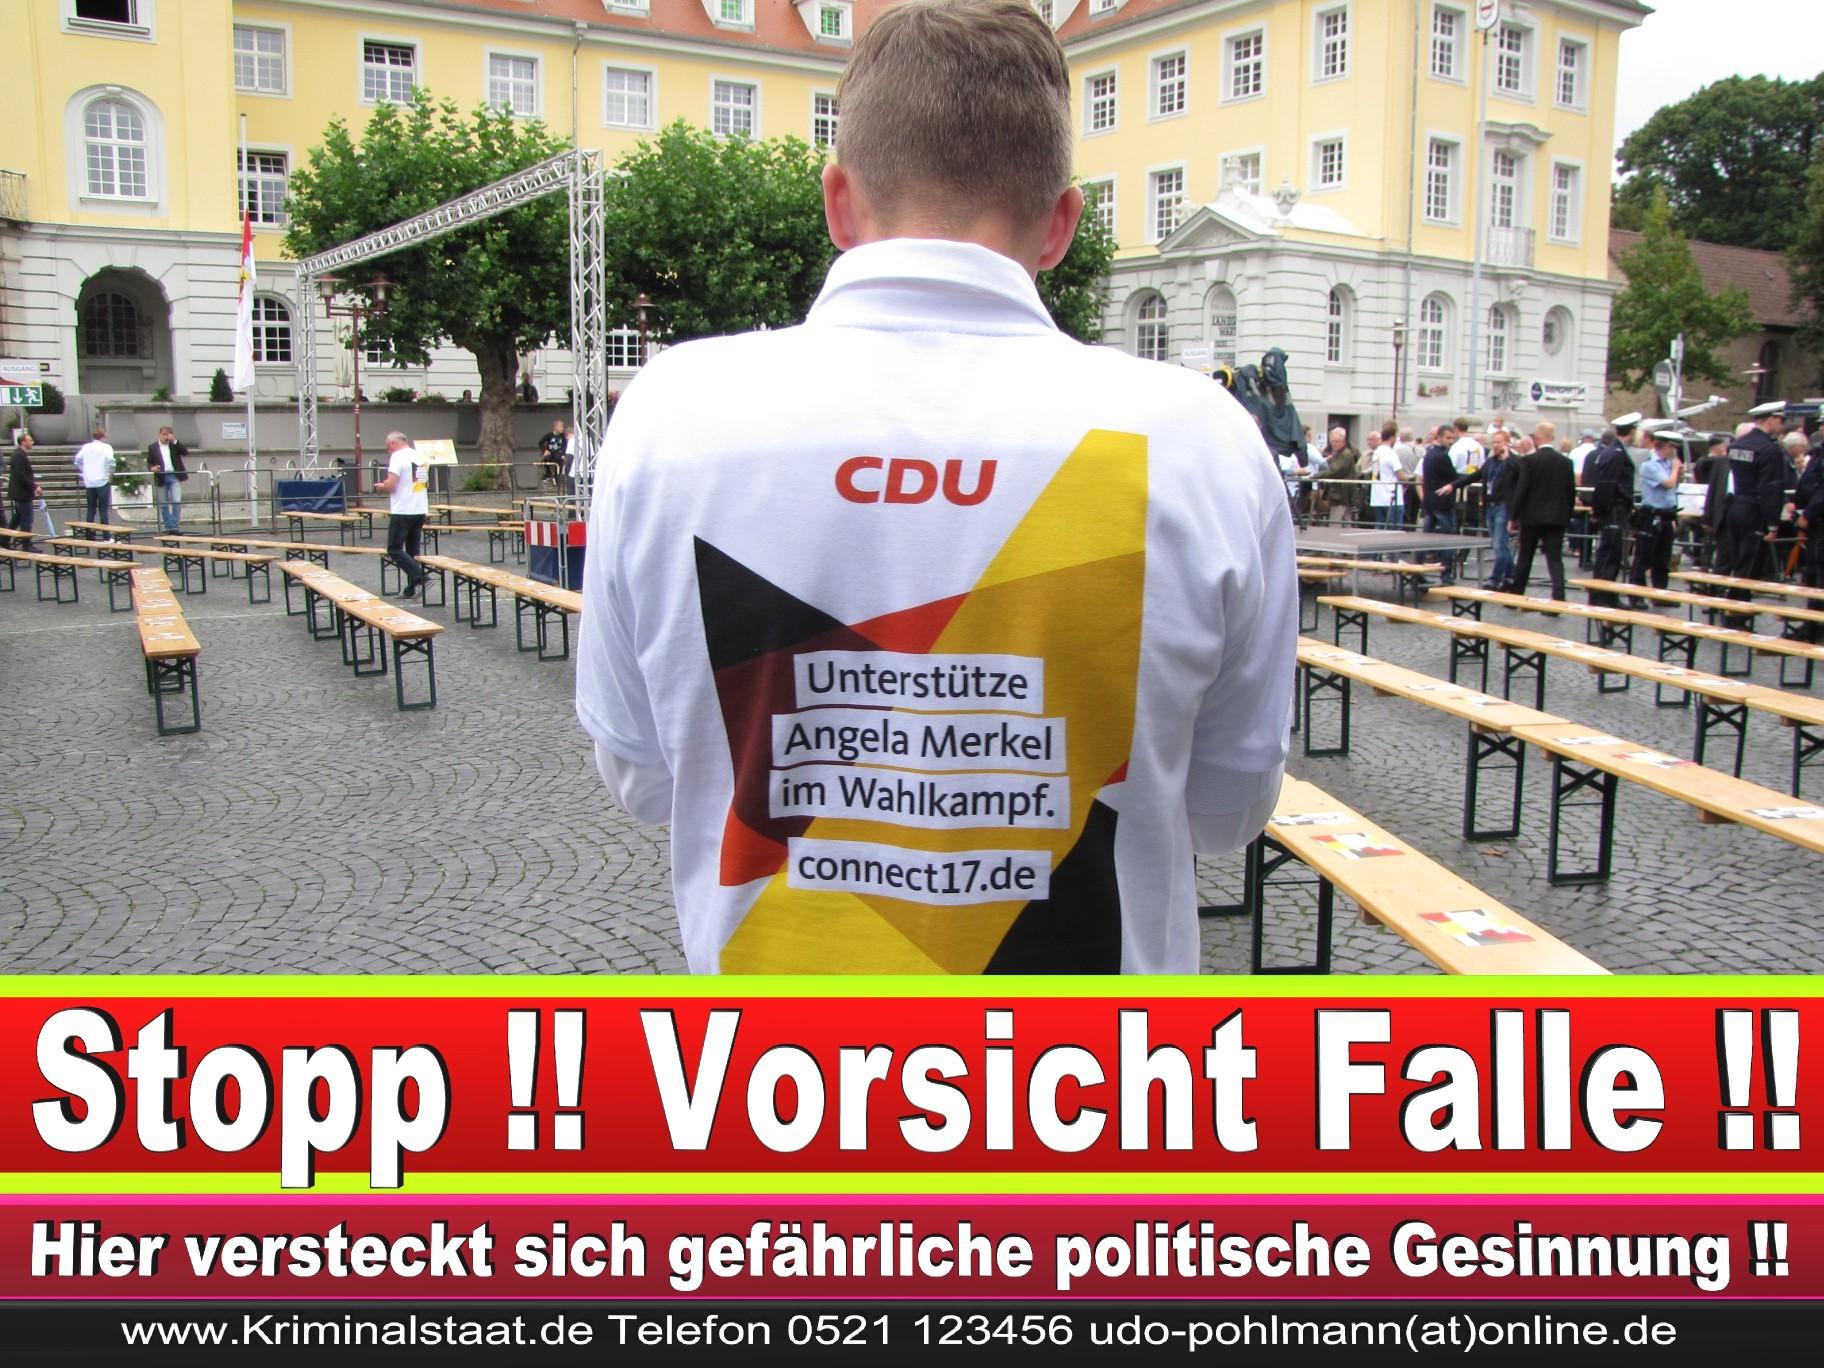 CDU HERFORD Kurruption Betrug Kinderpornografie Kinderpornos 19